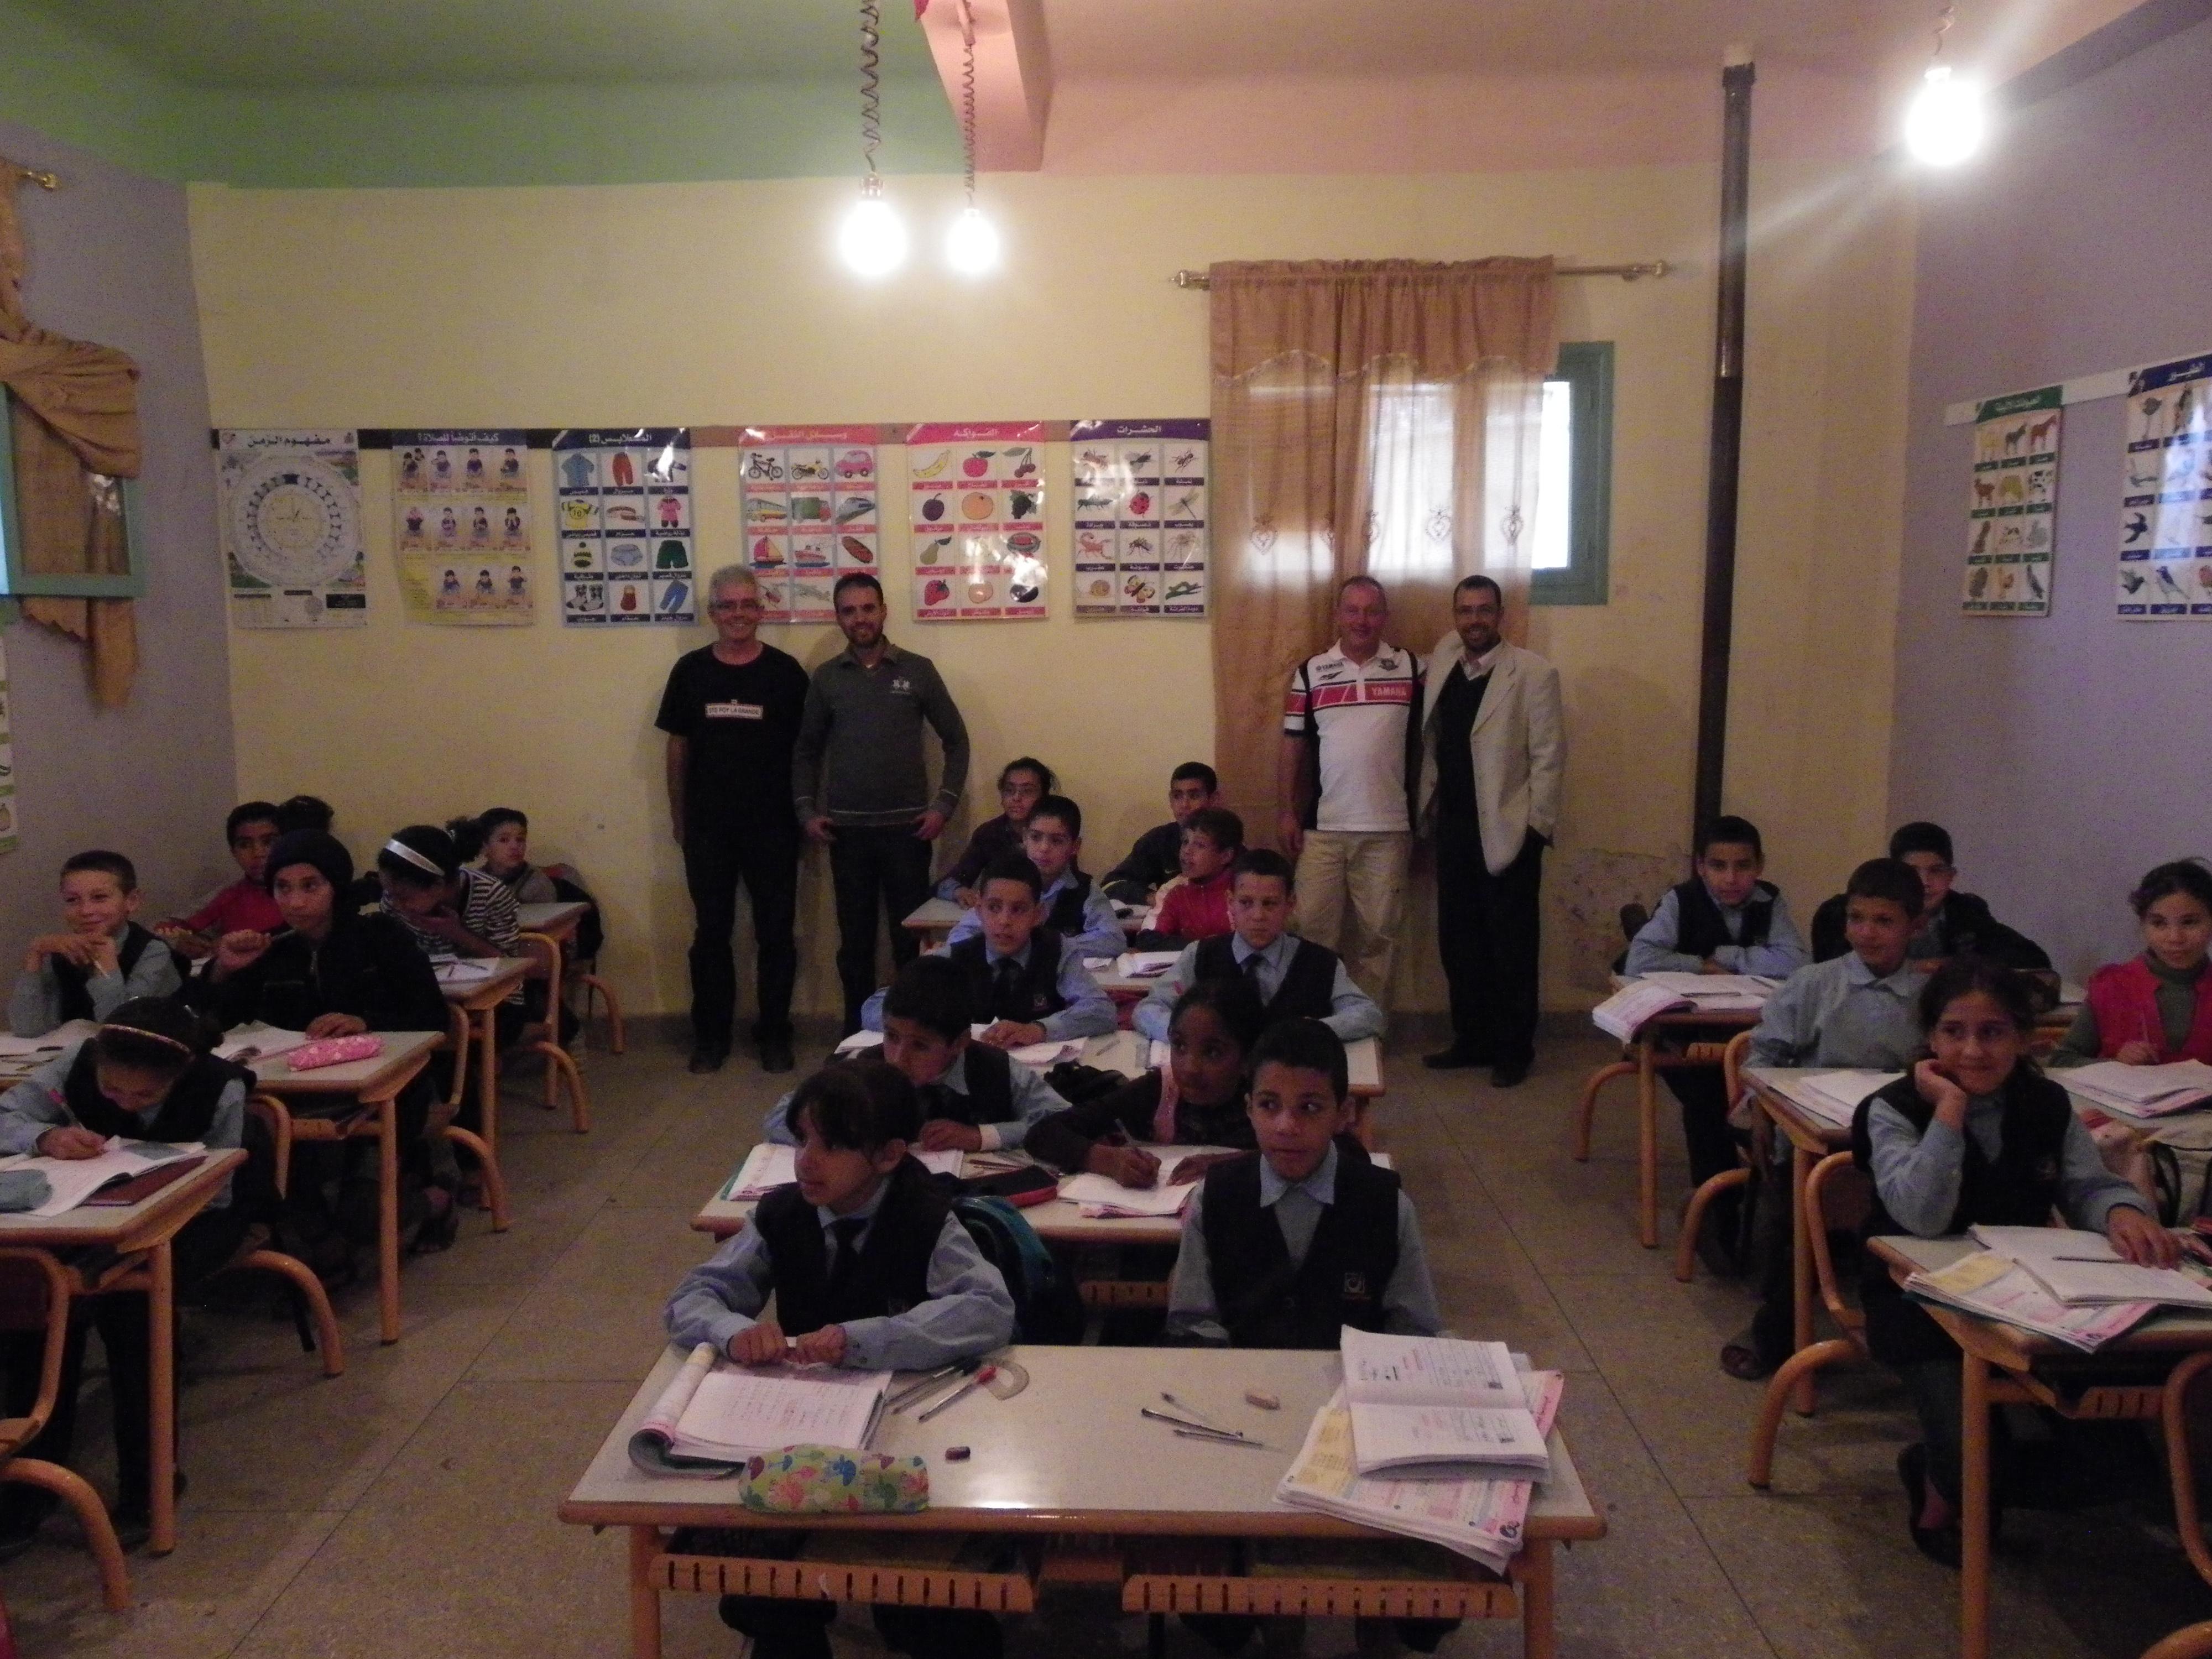 https://static.blog4ever.com/2012/02/654350/Maroc-3.JPG